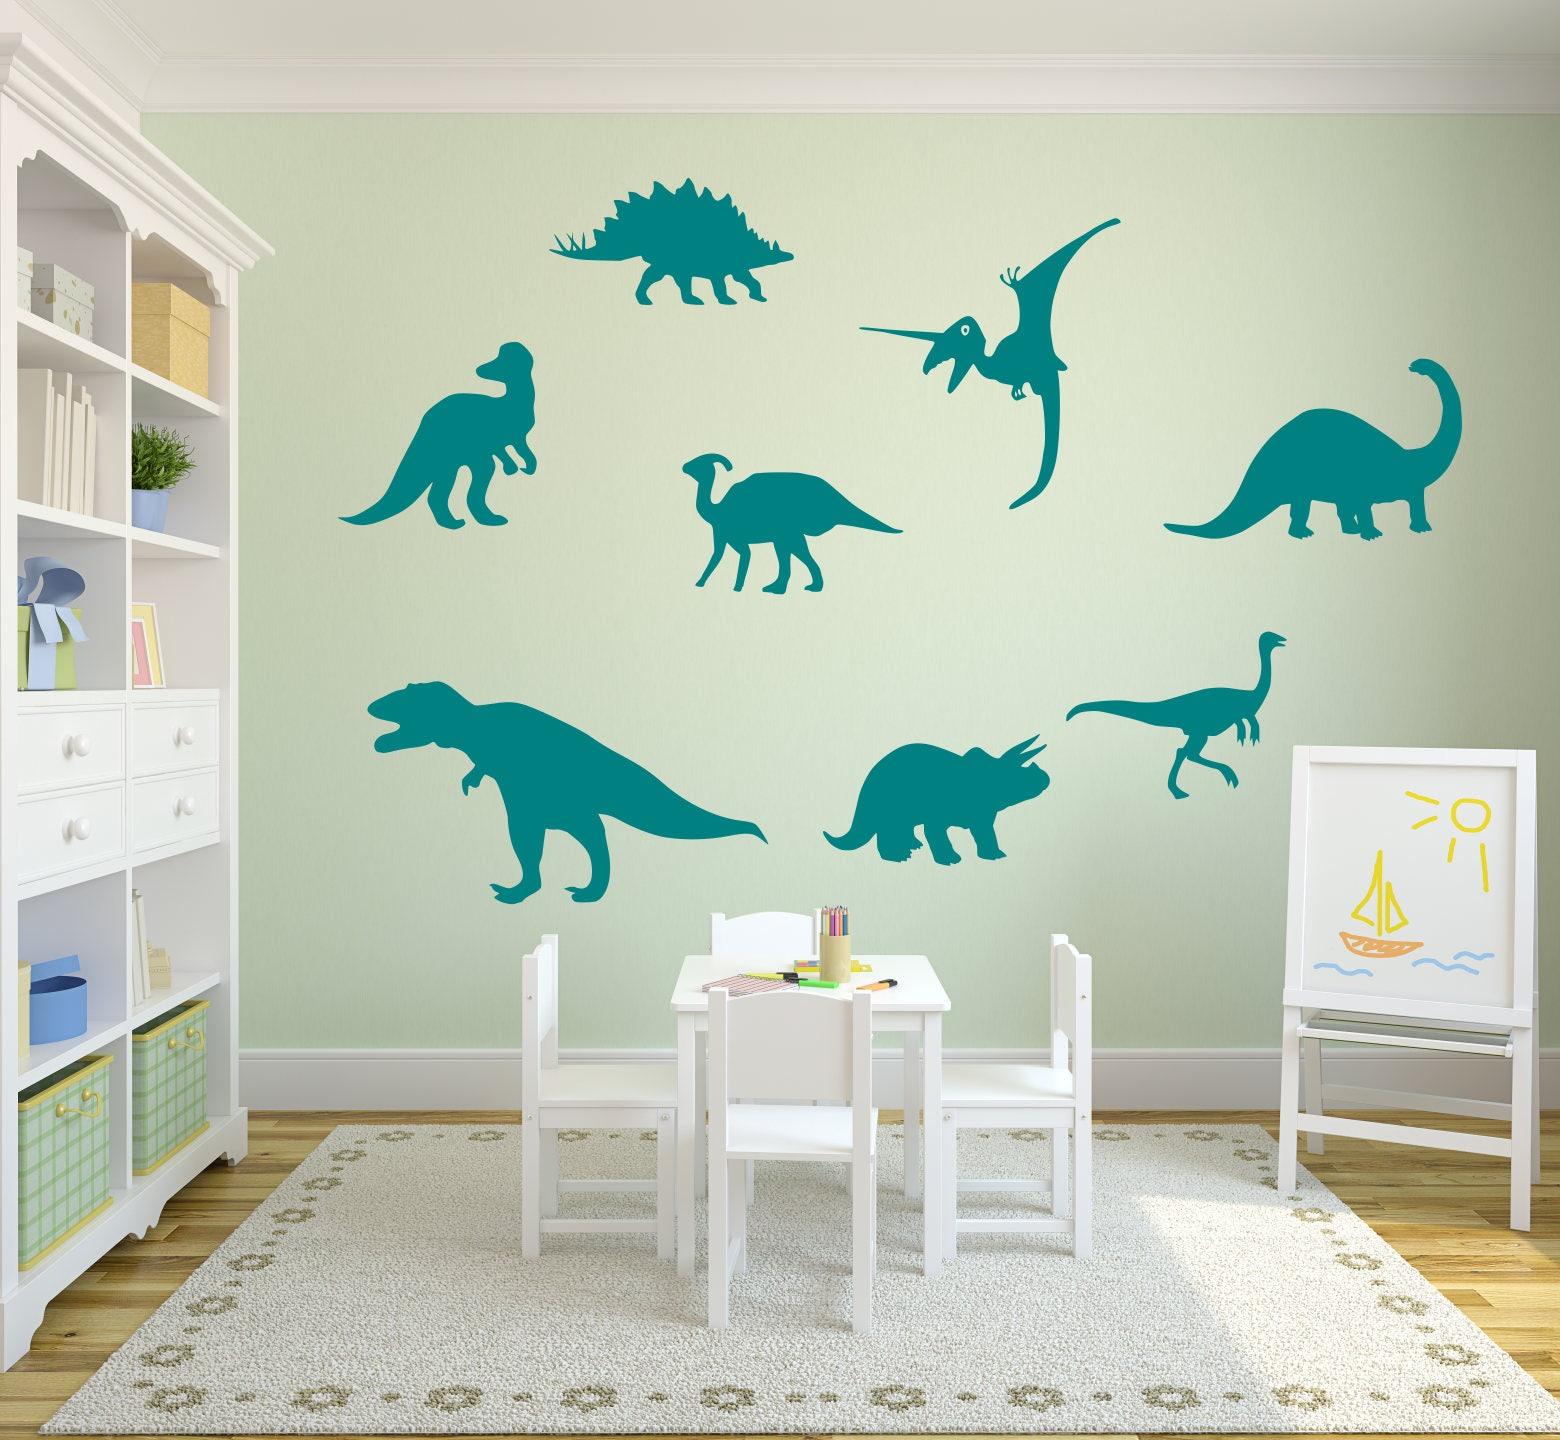 Dinosaur Wall Decals, Dinosaur Wall Art, Dinosaur Decals, Dinosaur Wall  Decor, Dino Decals, Prehistoric Decor, Kids Dinosaur Art